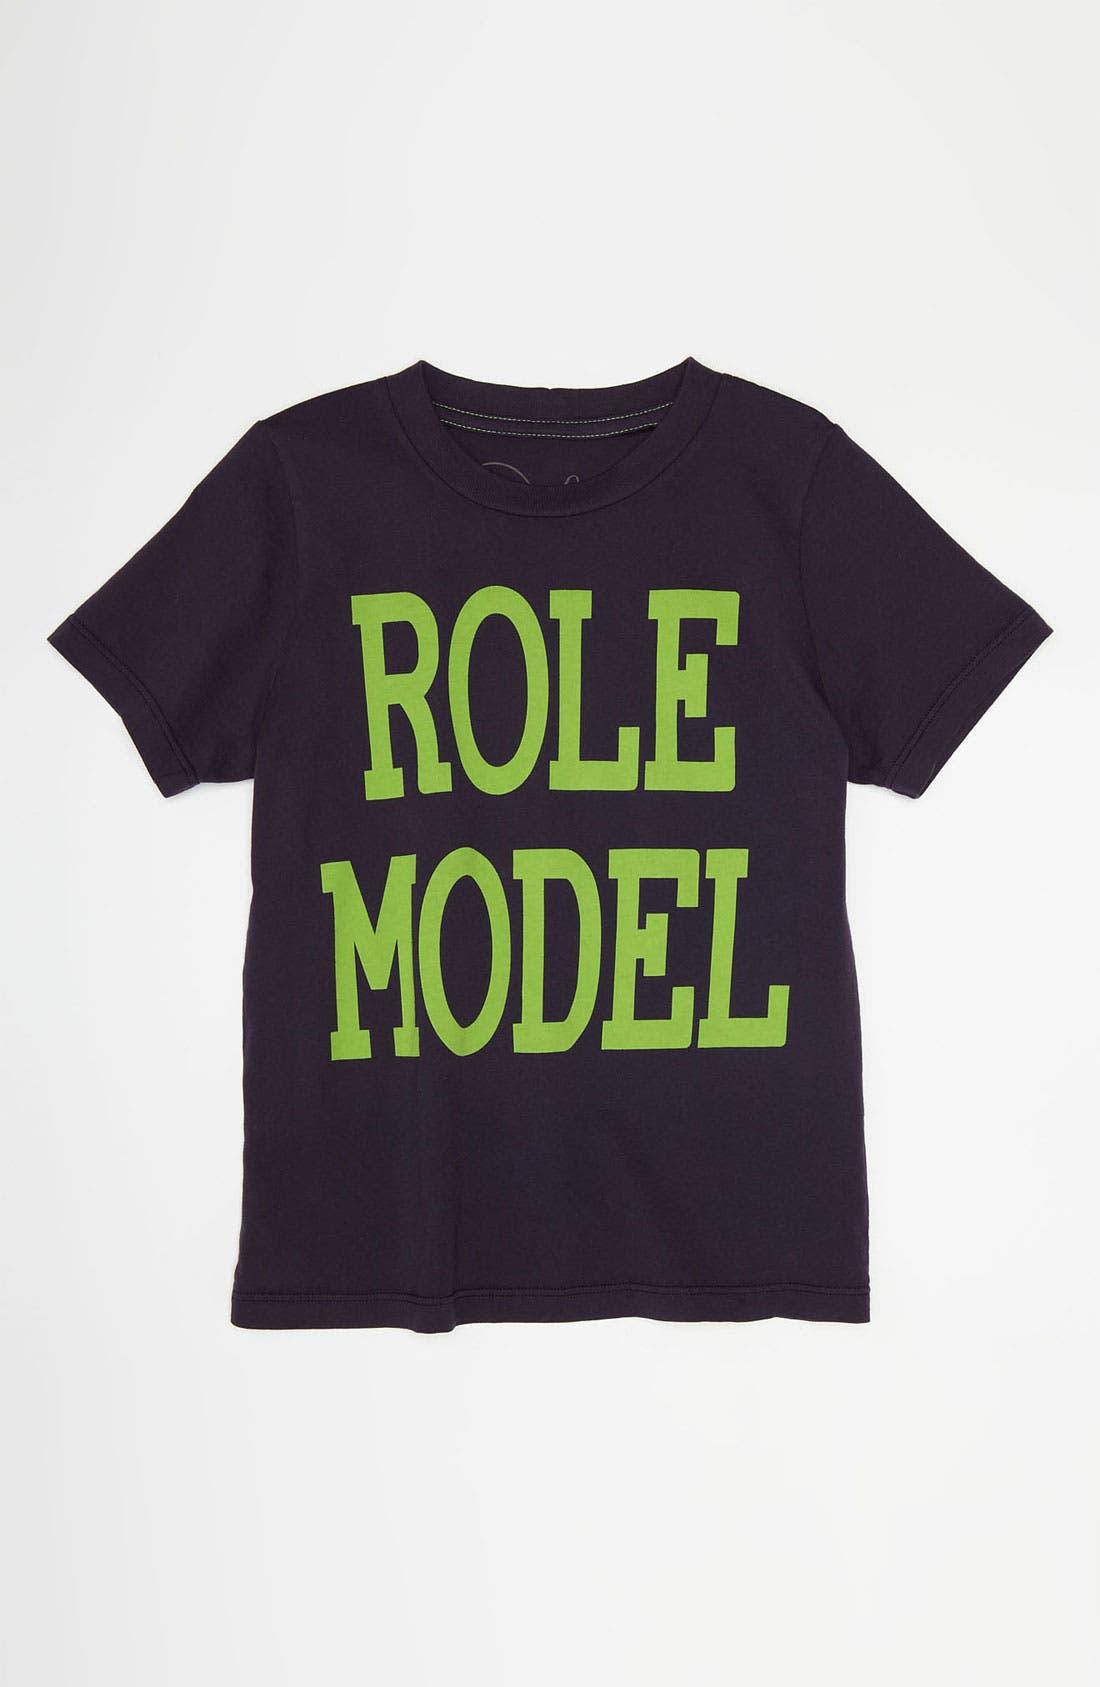 Alternate Image 1 Selected - Peek 'Role Model' T-Shirt (Little Boys & Big Boys)